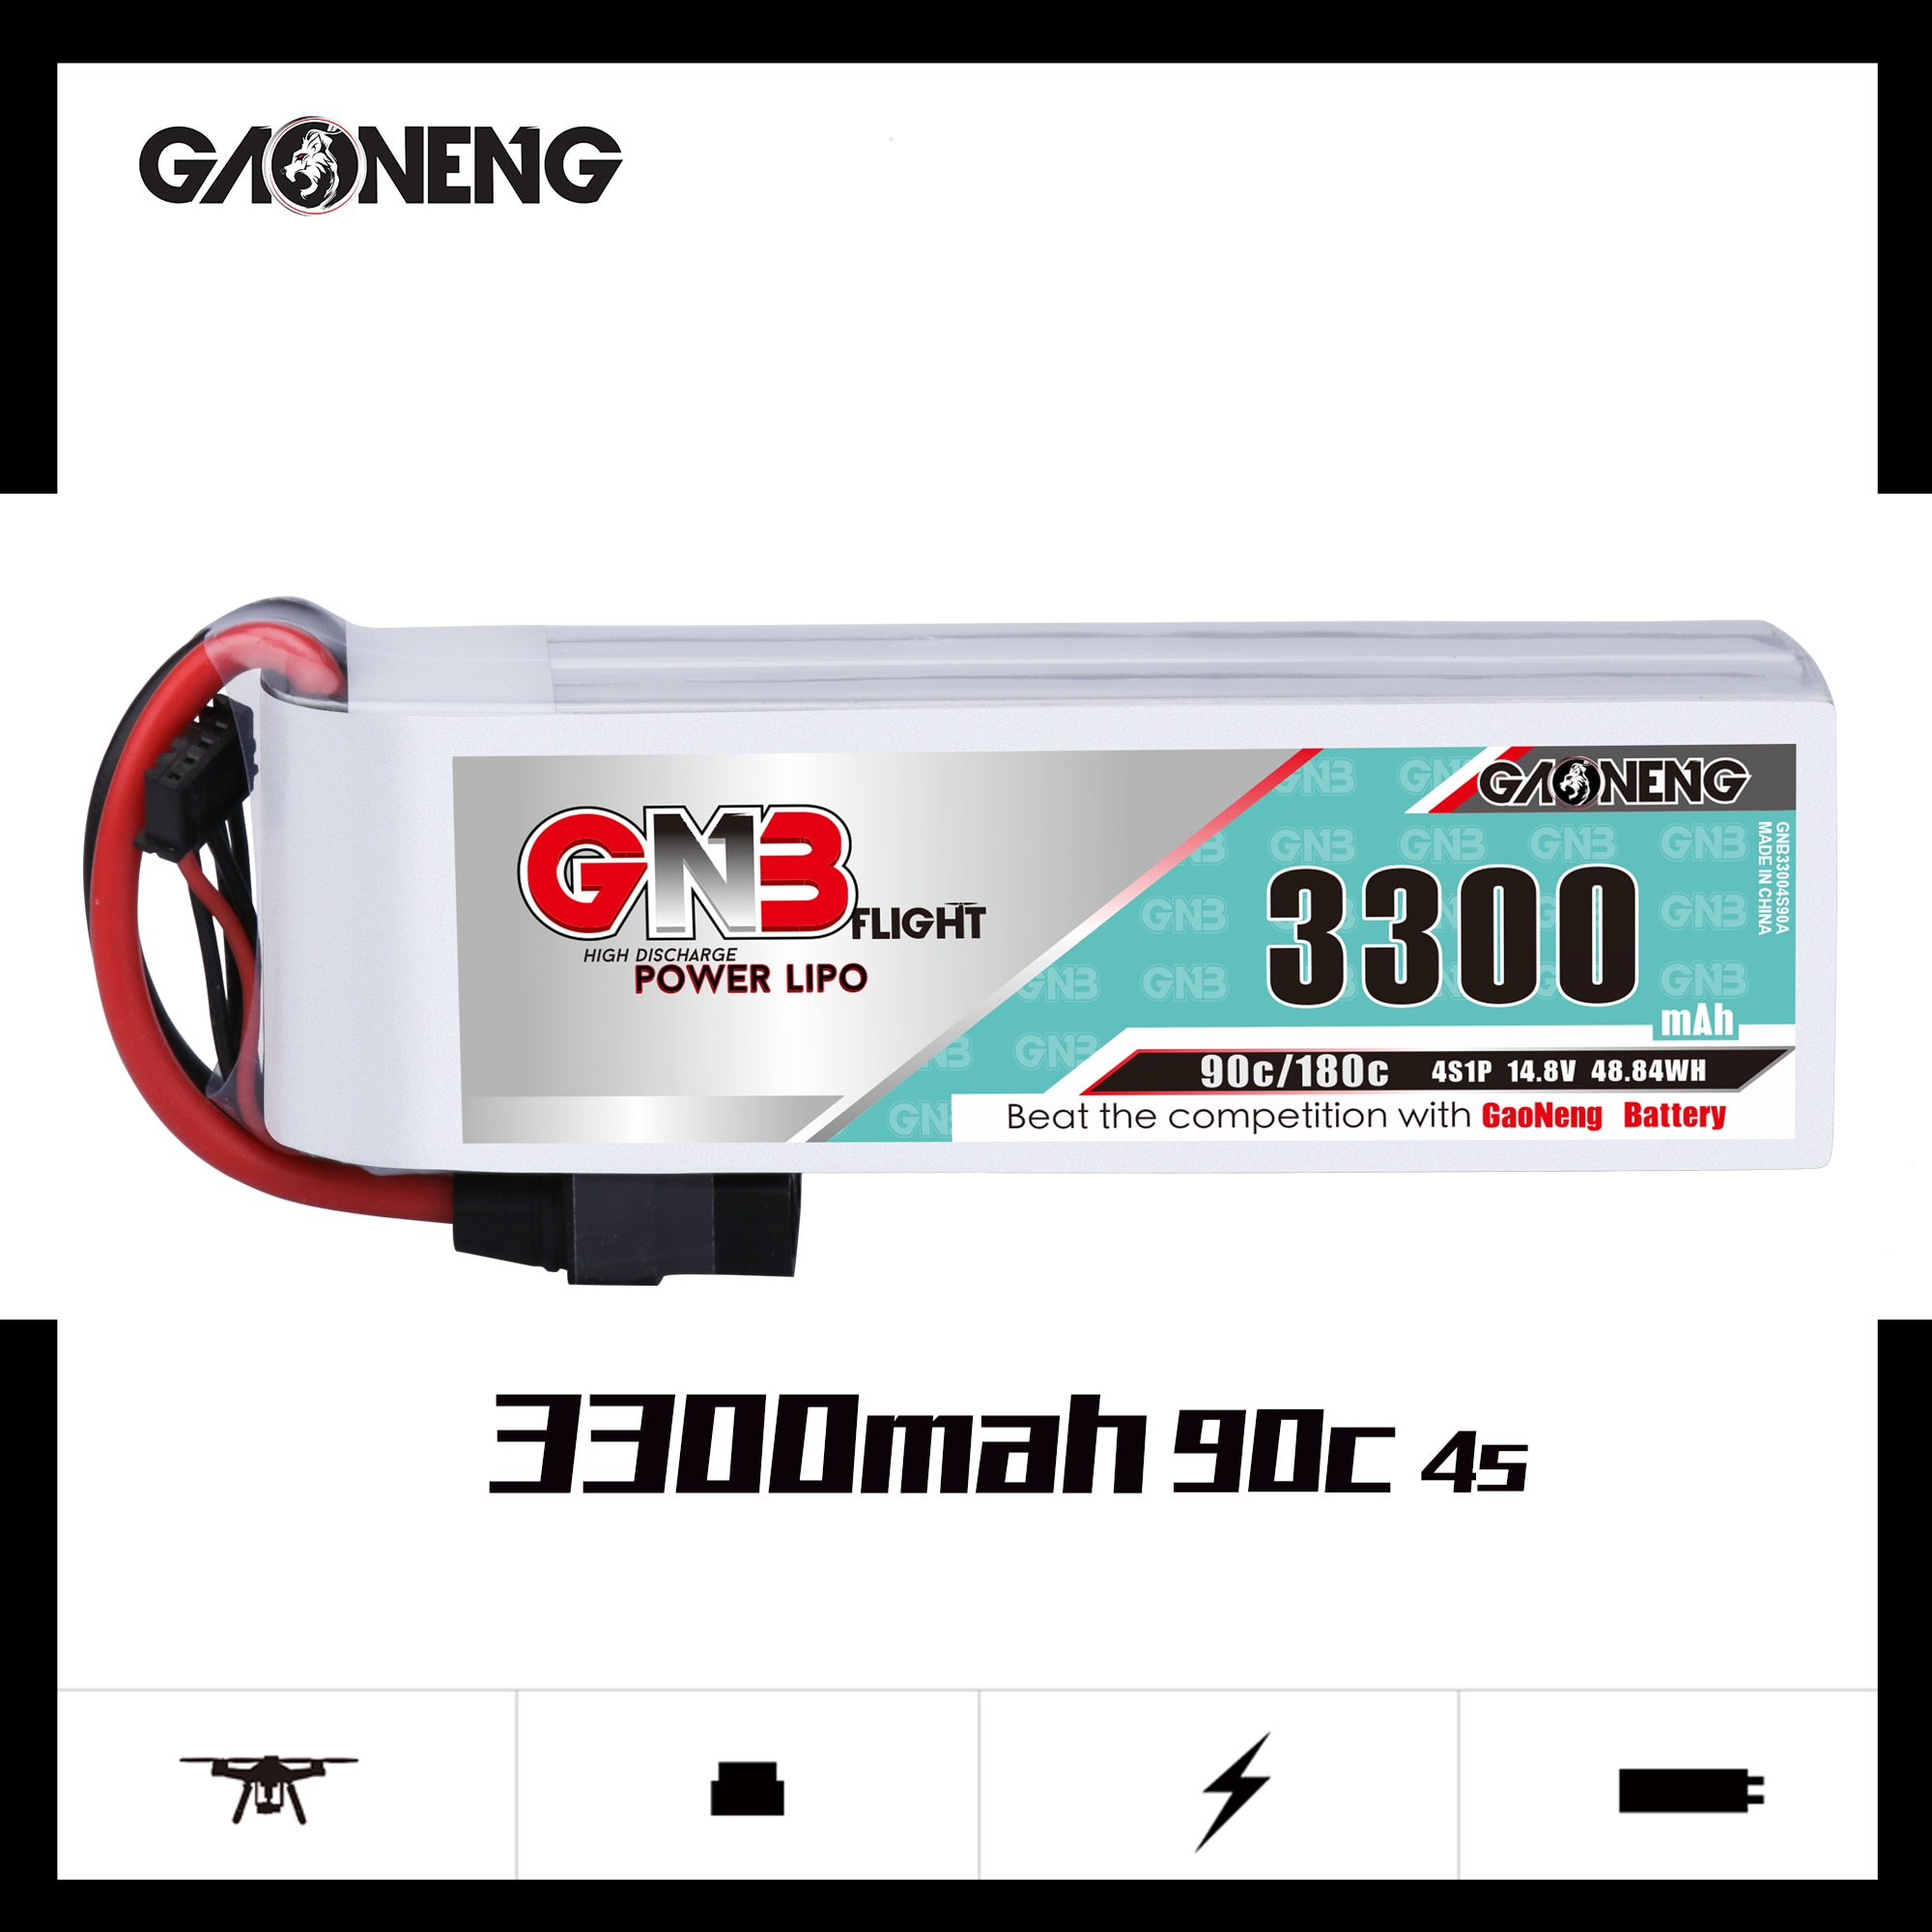 Gaoneng GNB 3300mAh 4S 90C 14.8V Lipo Battery XT60 XT90 T Plug Fixed Wing Vehicle Model Ship High Performance Lithium Battery